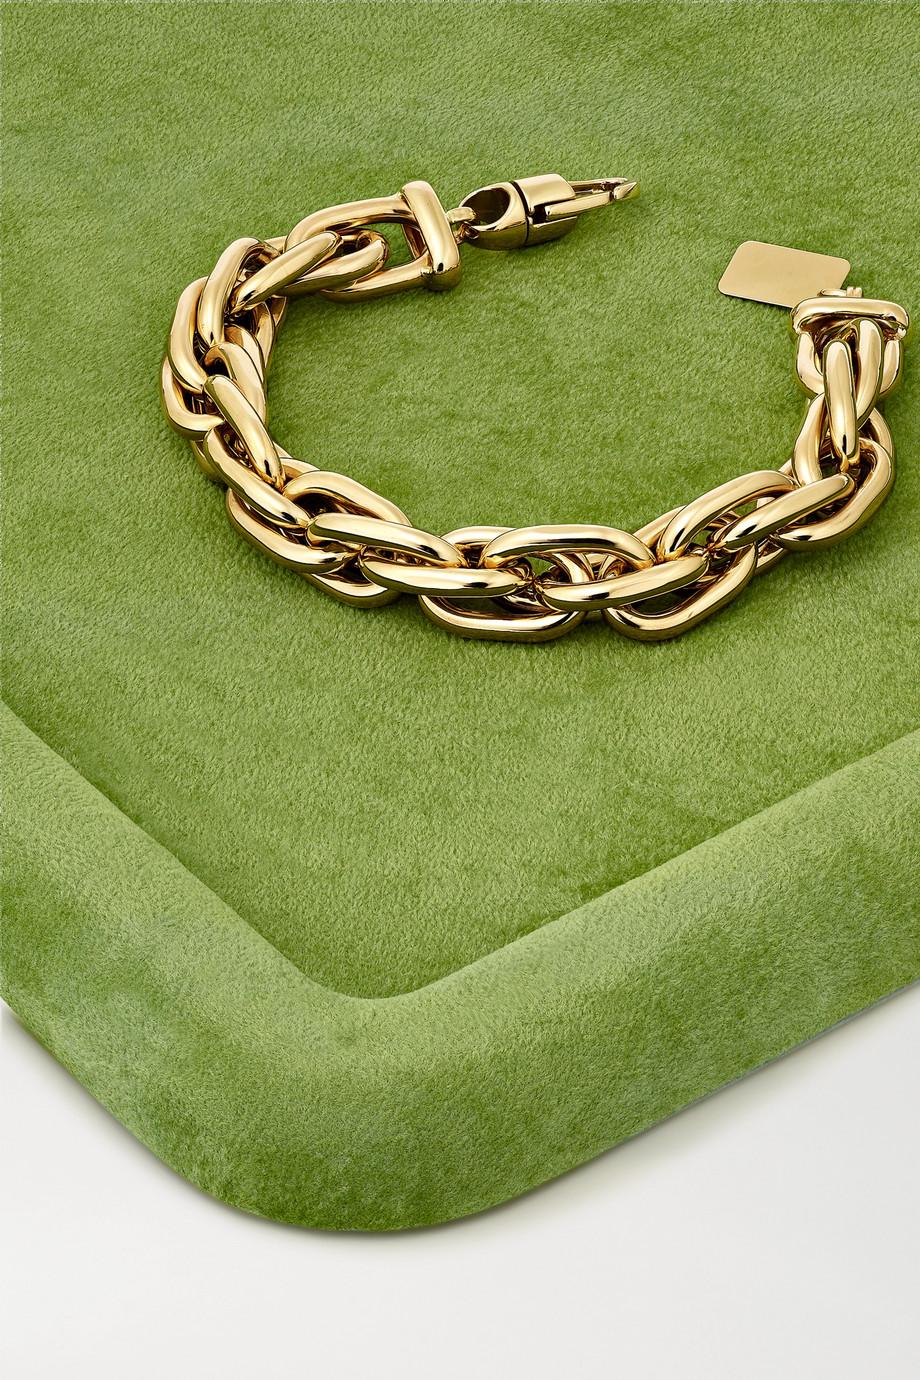 Lauren Rubinski Suede jewelry tray